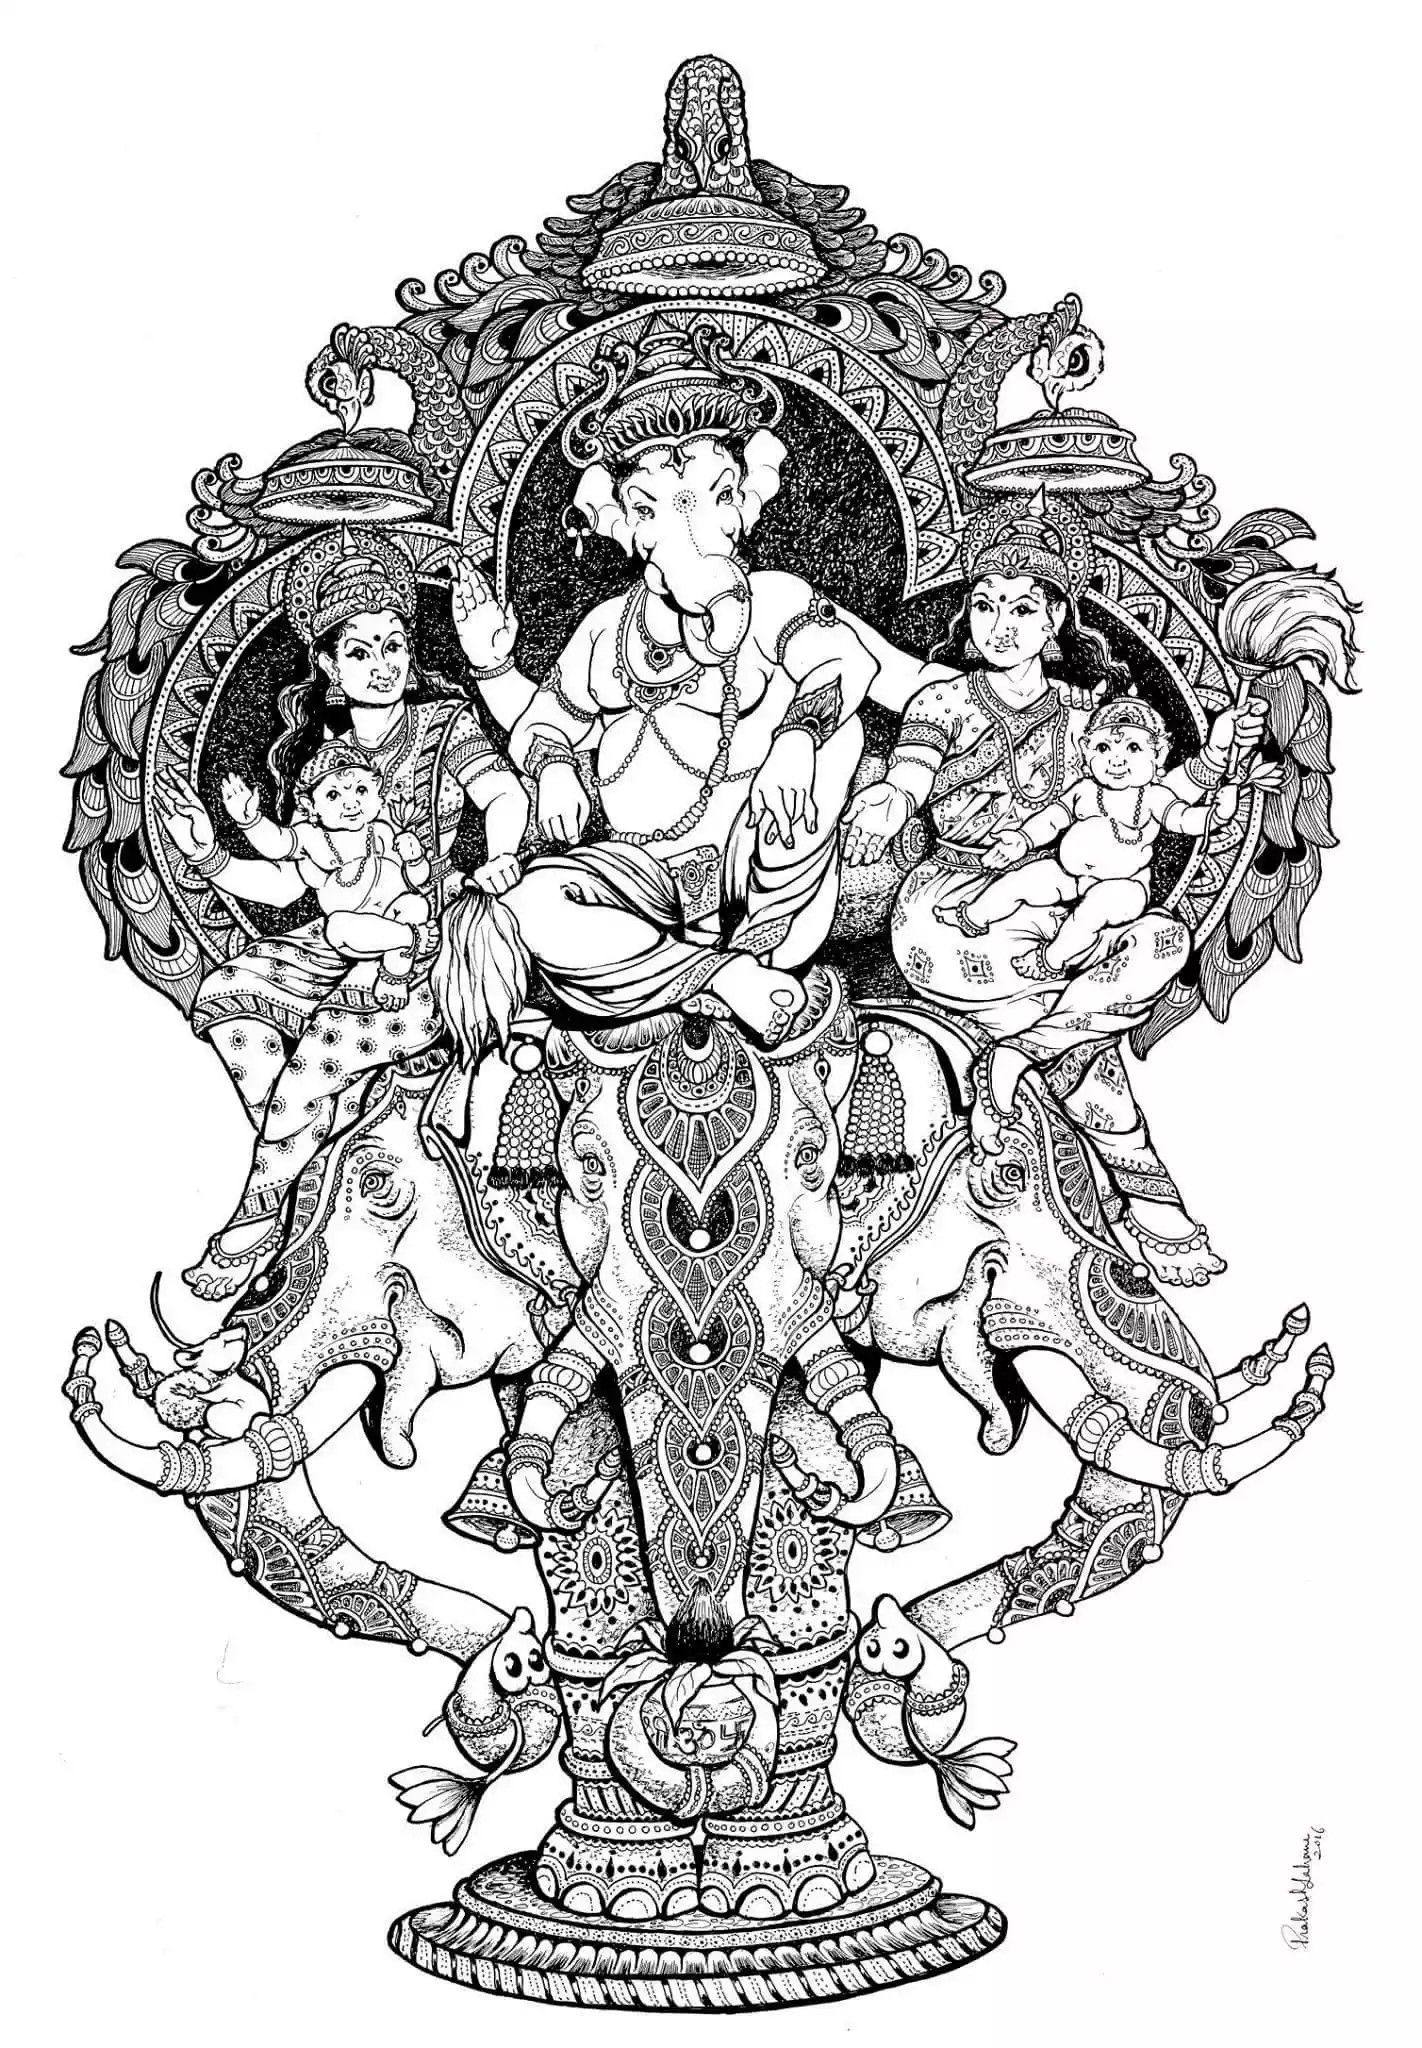 Ganesh idol ganesha art lord ganesha lord shiva shri hanuman shree